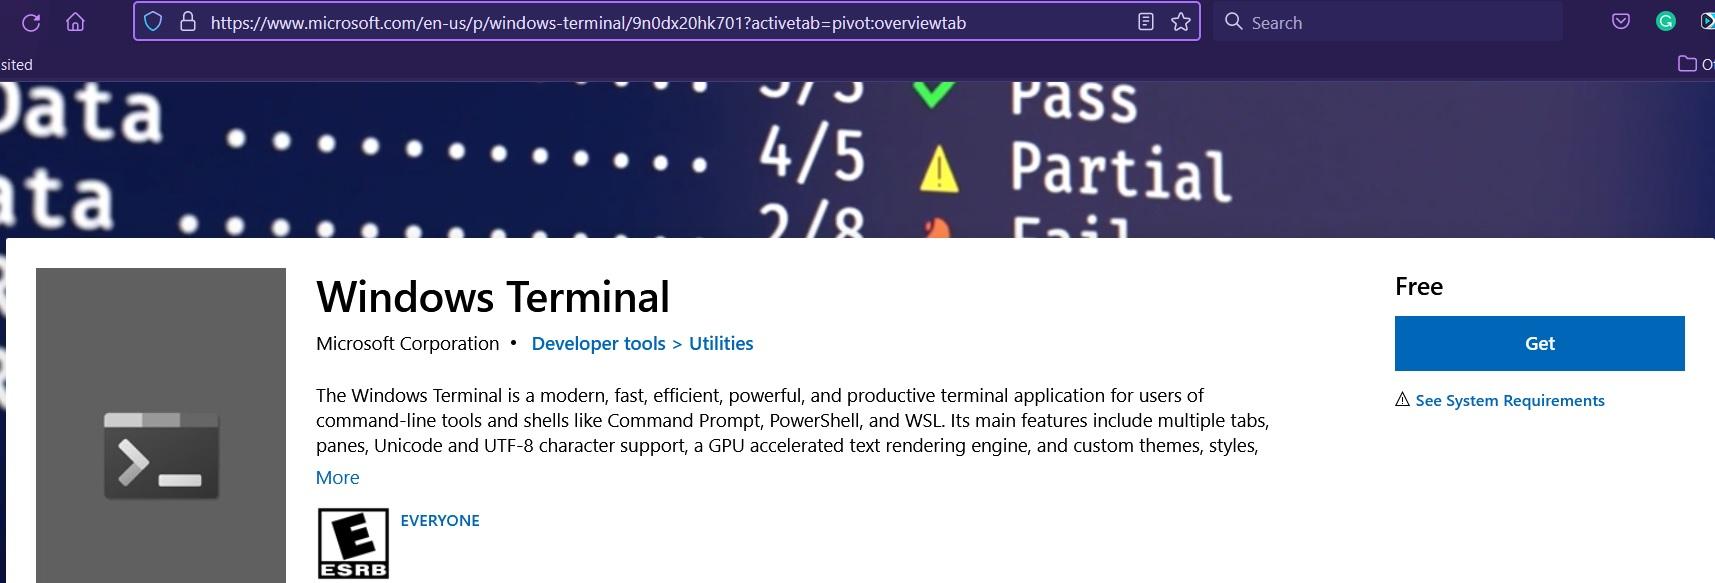 Install Windows Terminal on Windows 10 - Download